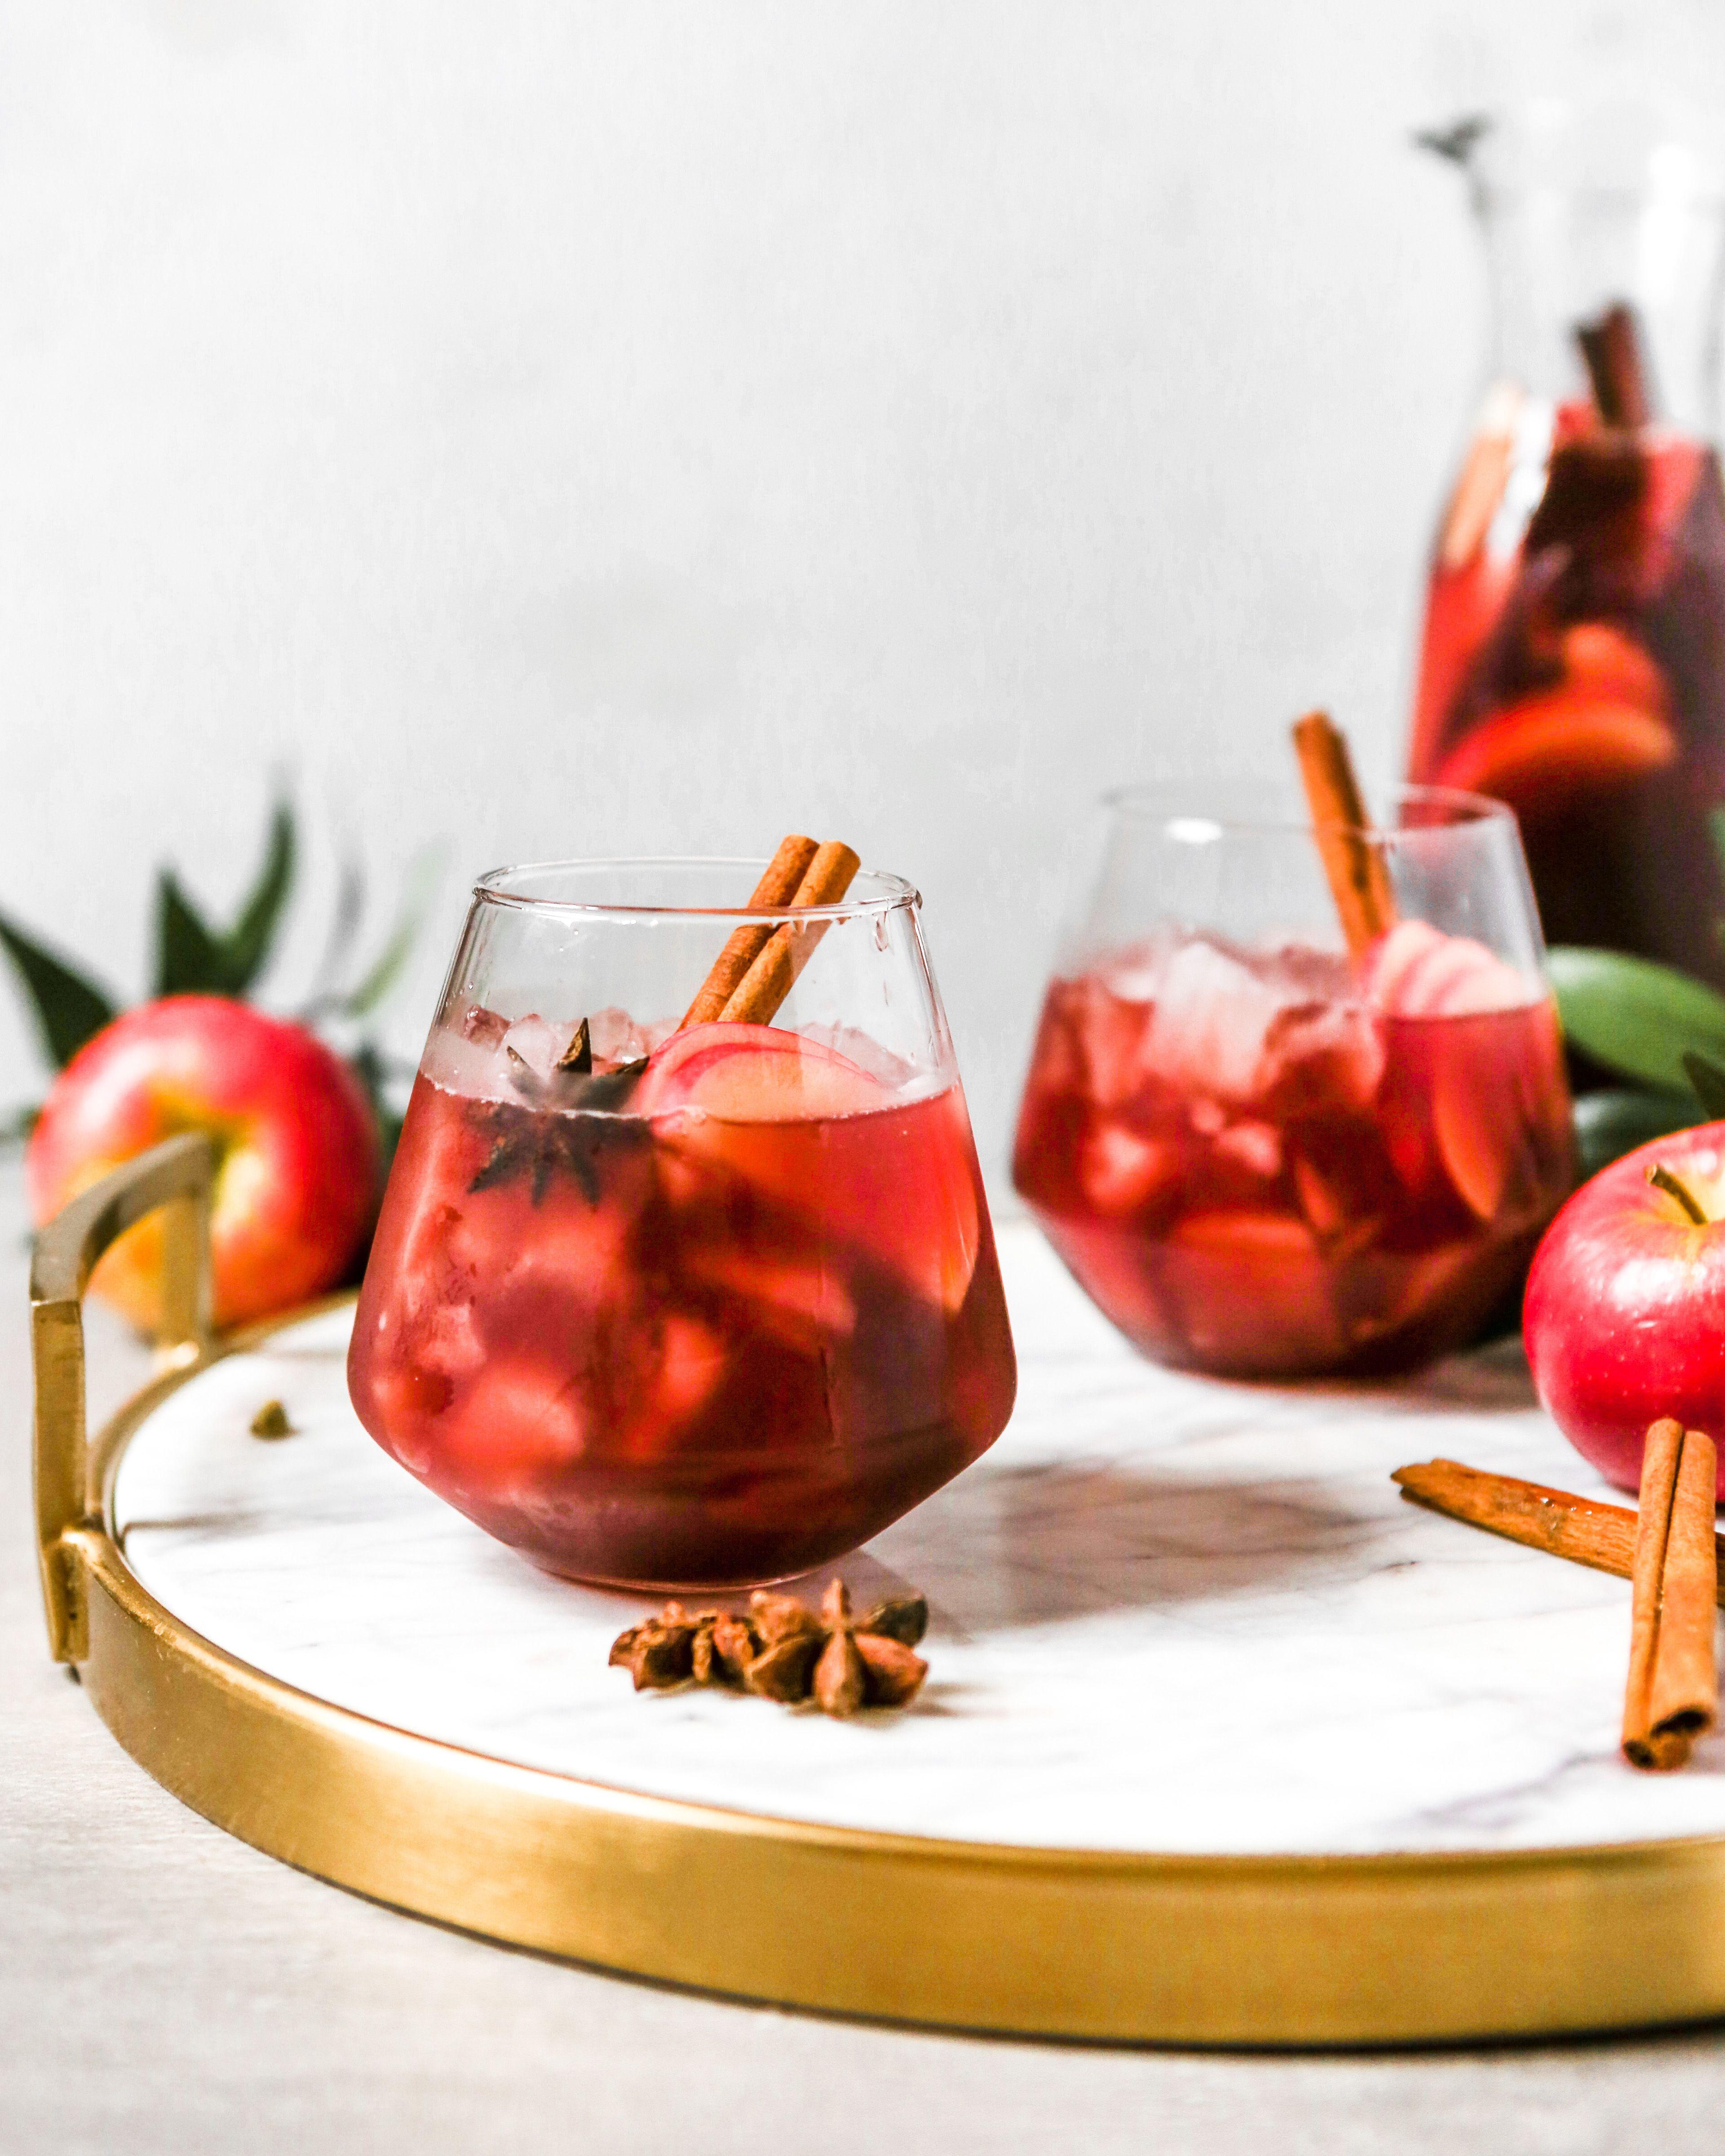 Autumn Red Wine Apple Cider Sangria Zestful Kitchen Recipe Cider Sangria Apple Cider Sangria Apple Cider Recipe